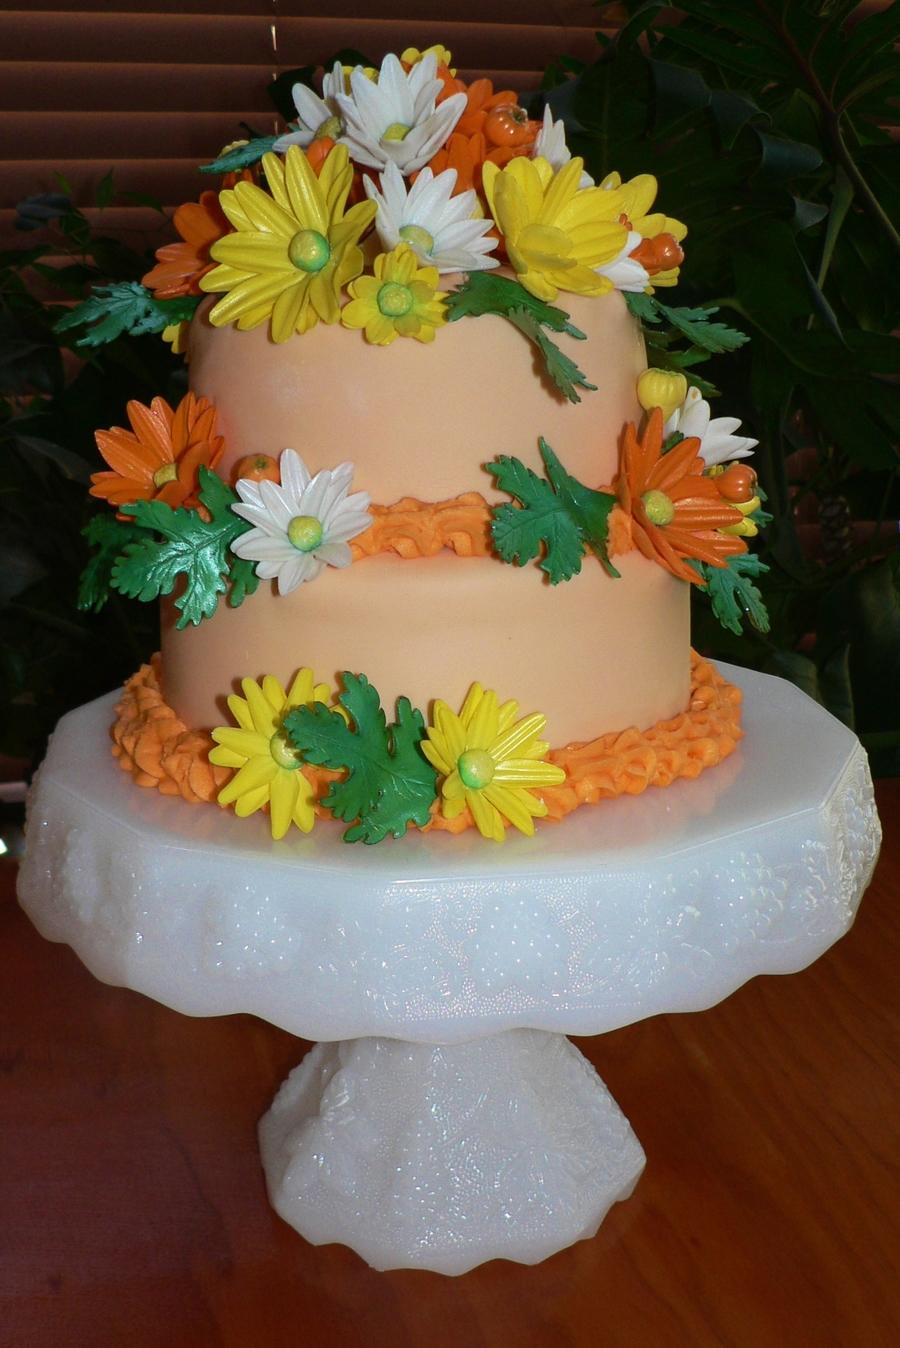 Daisy flower birthday cake cakecentral izmirmasajfo